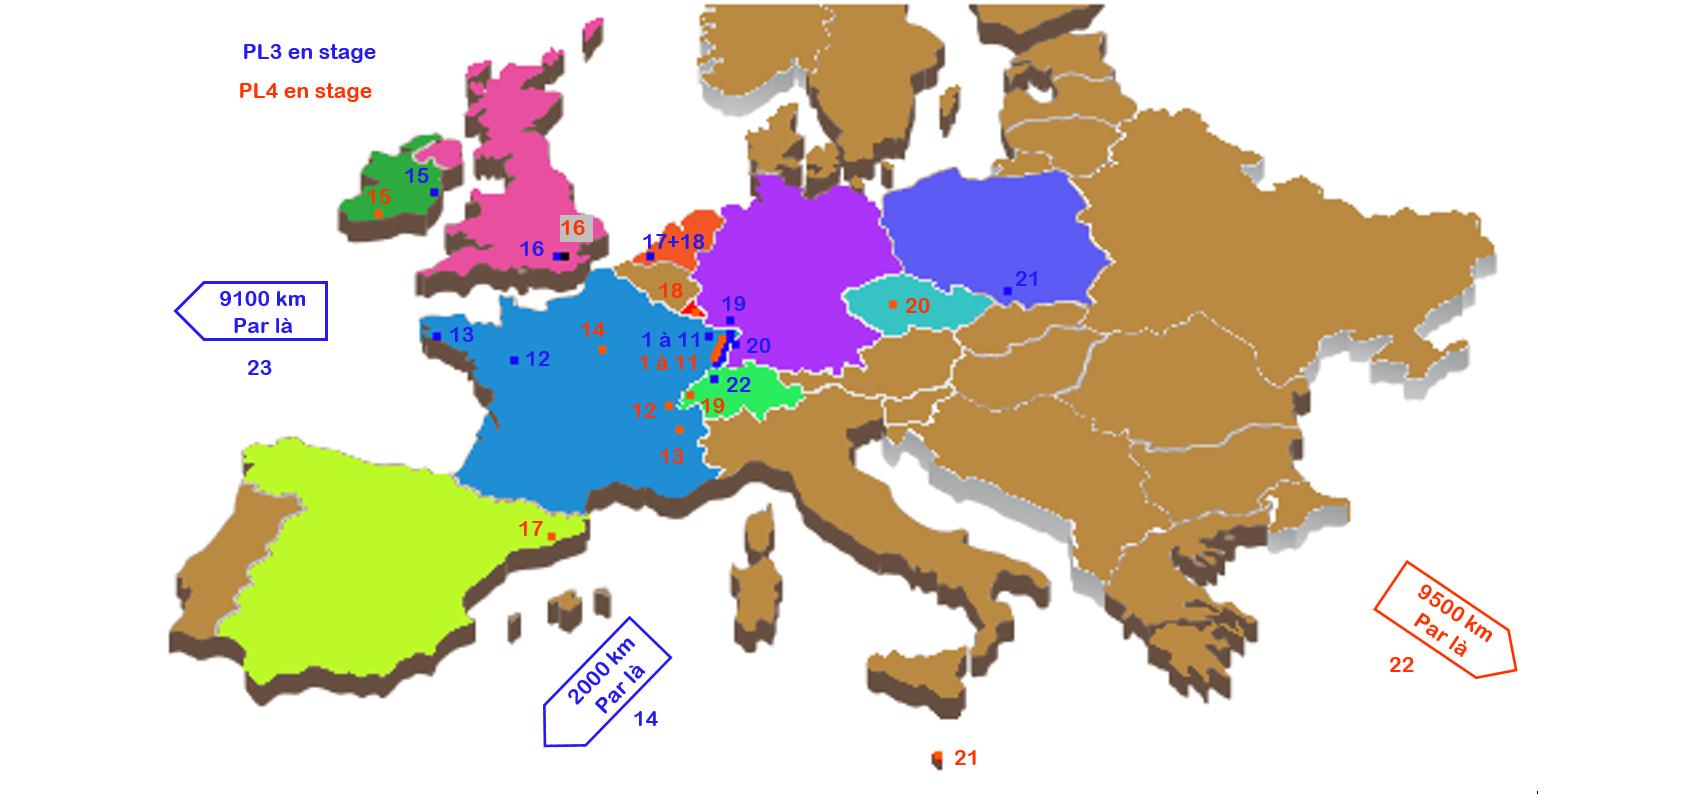 carte europe_stage2016_PL3PL4